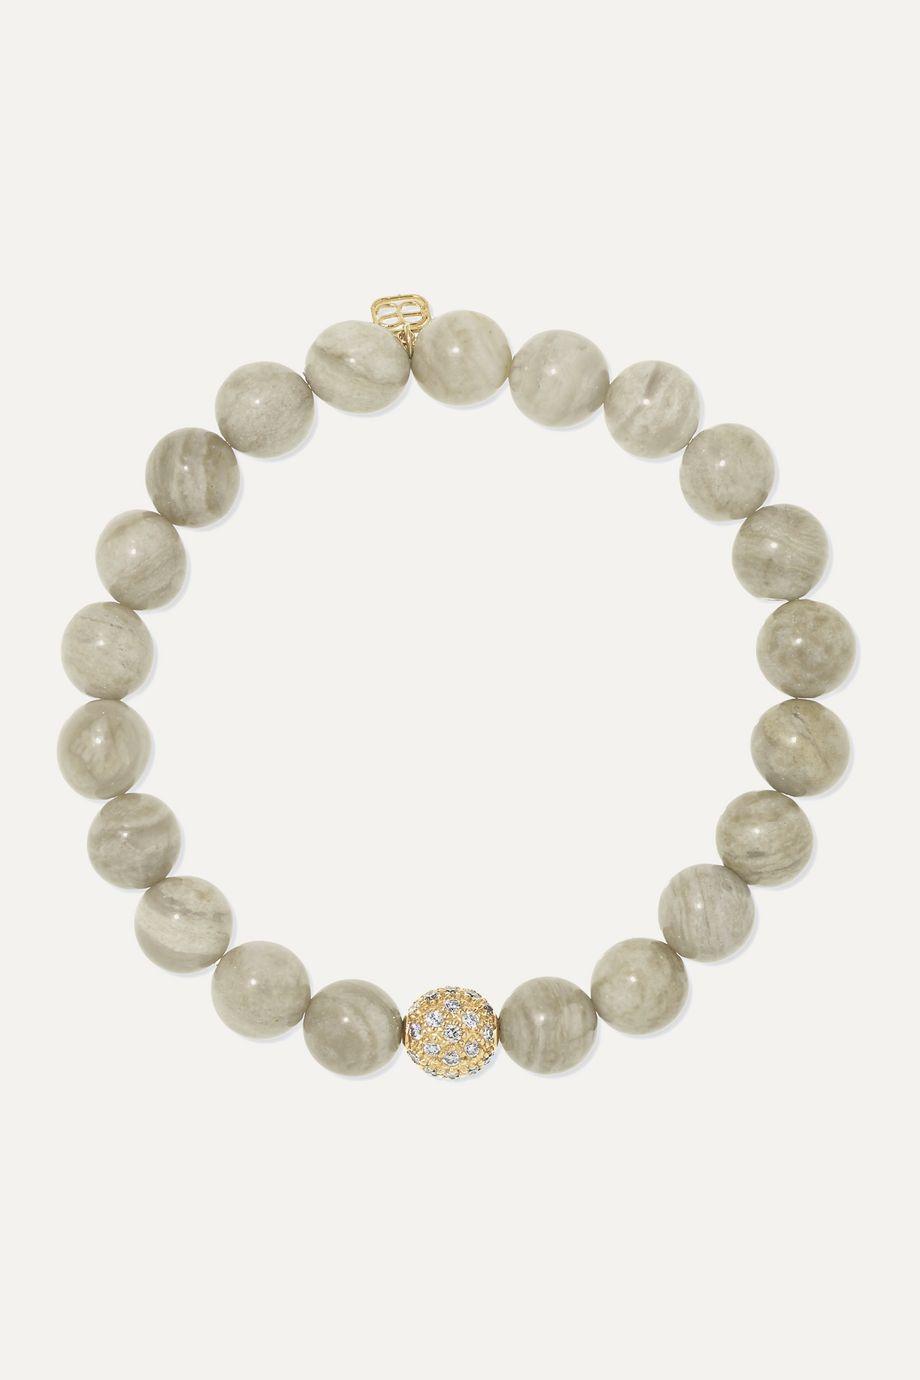 Sydney Evan 14-karat gold, jasper and diamond bracelet